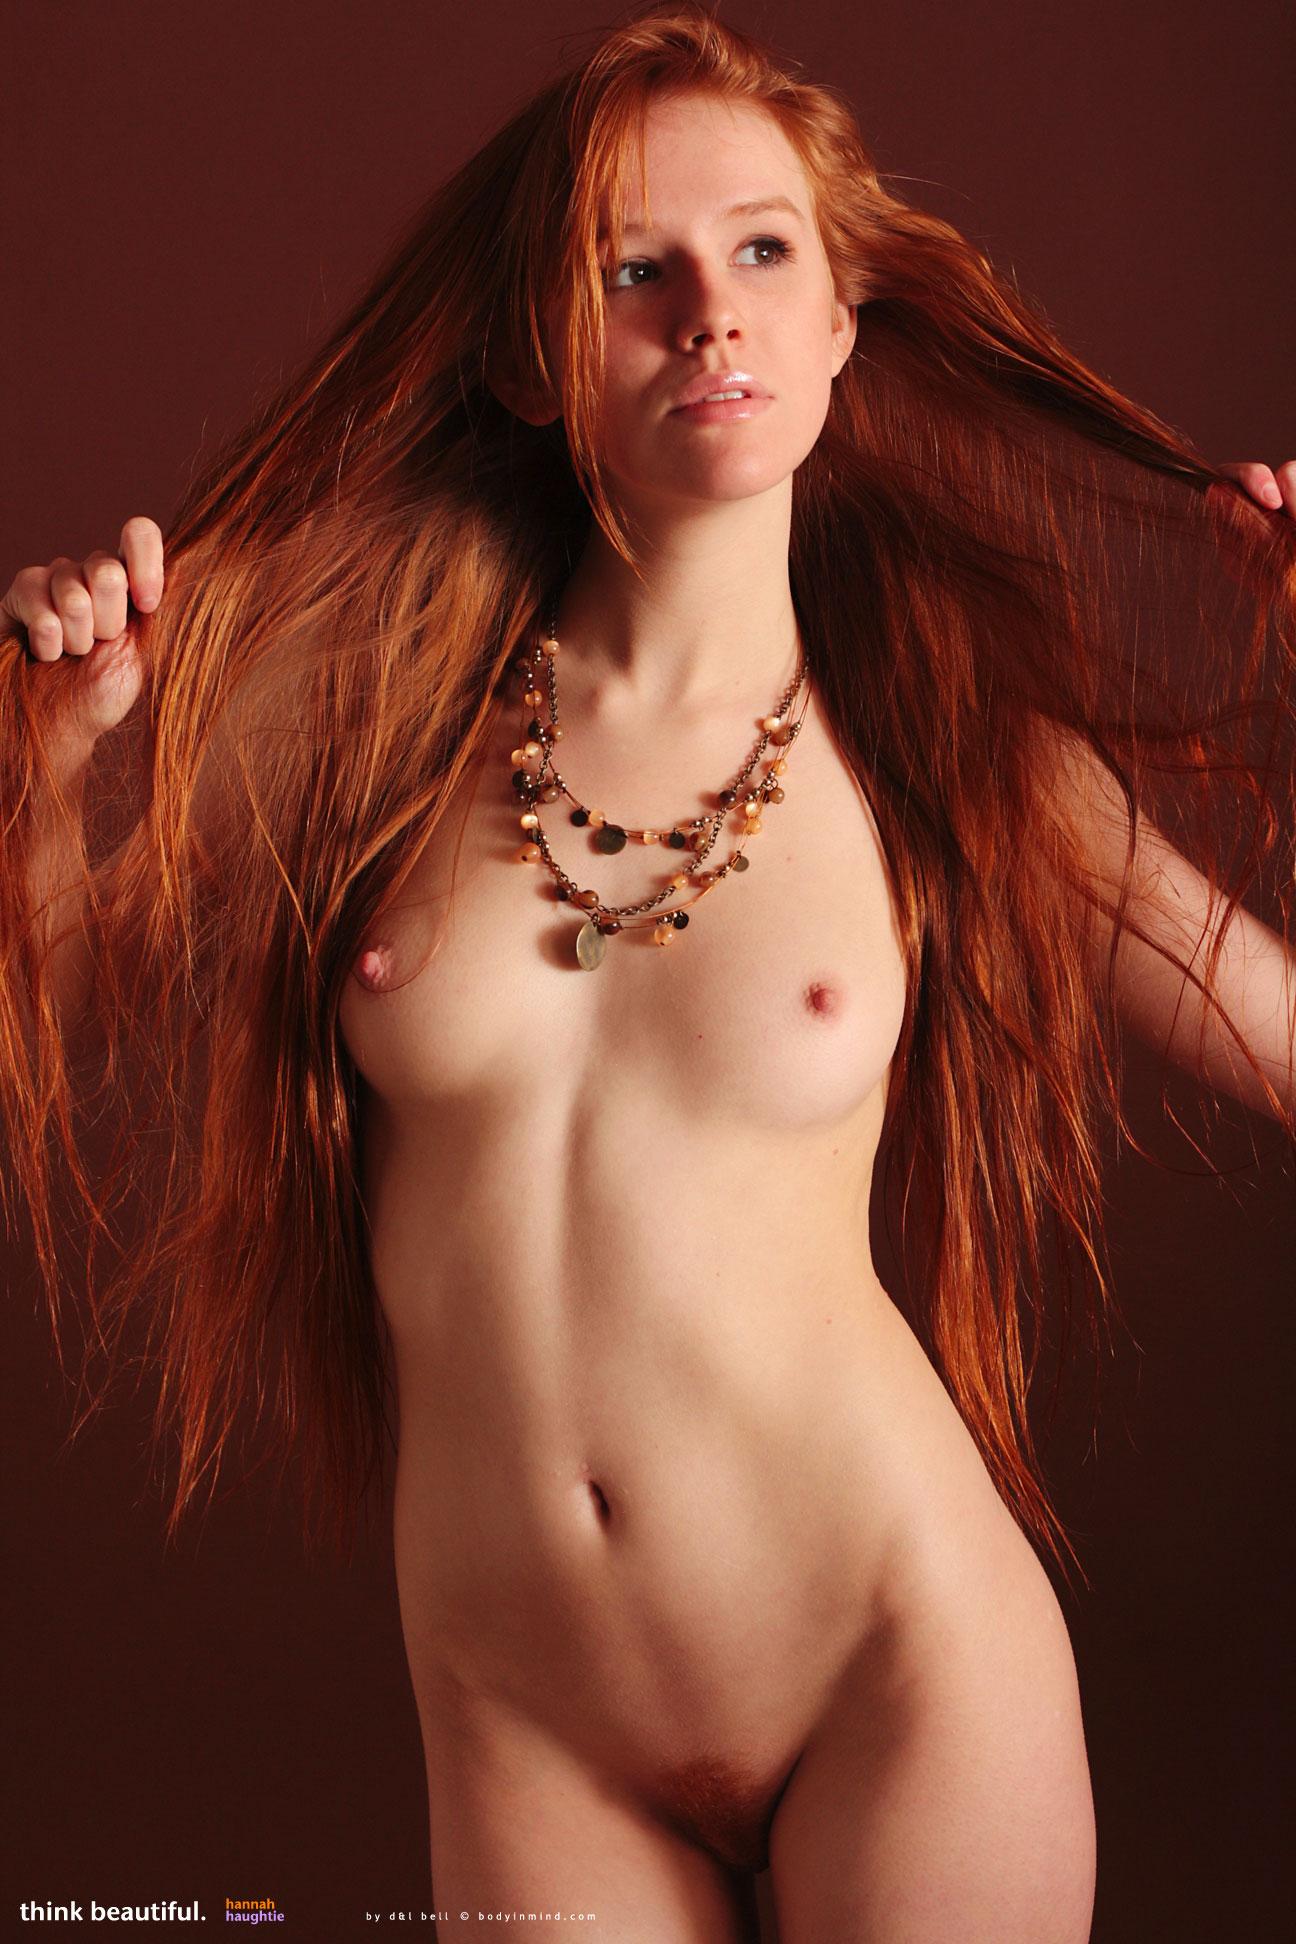 hannah-long-hair-redhead-naked-young-bodyinmind-09